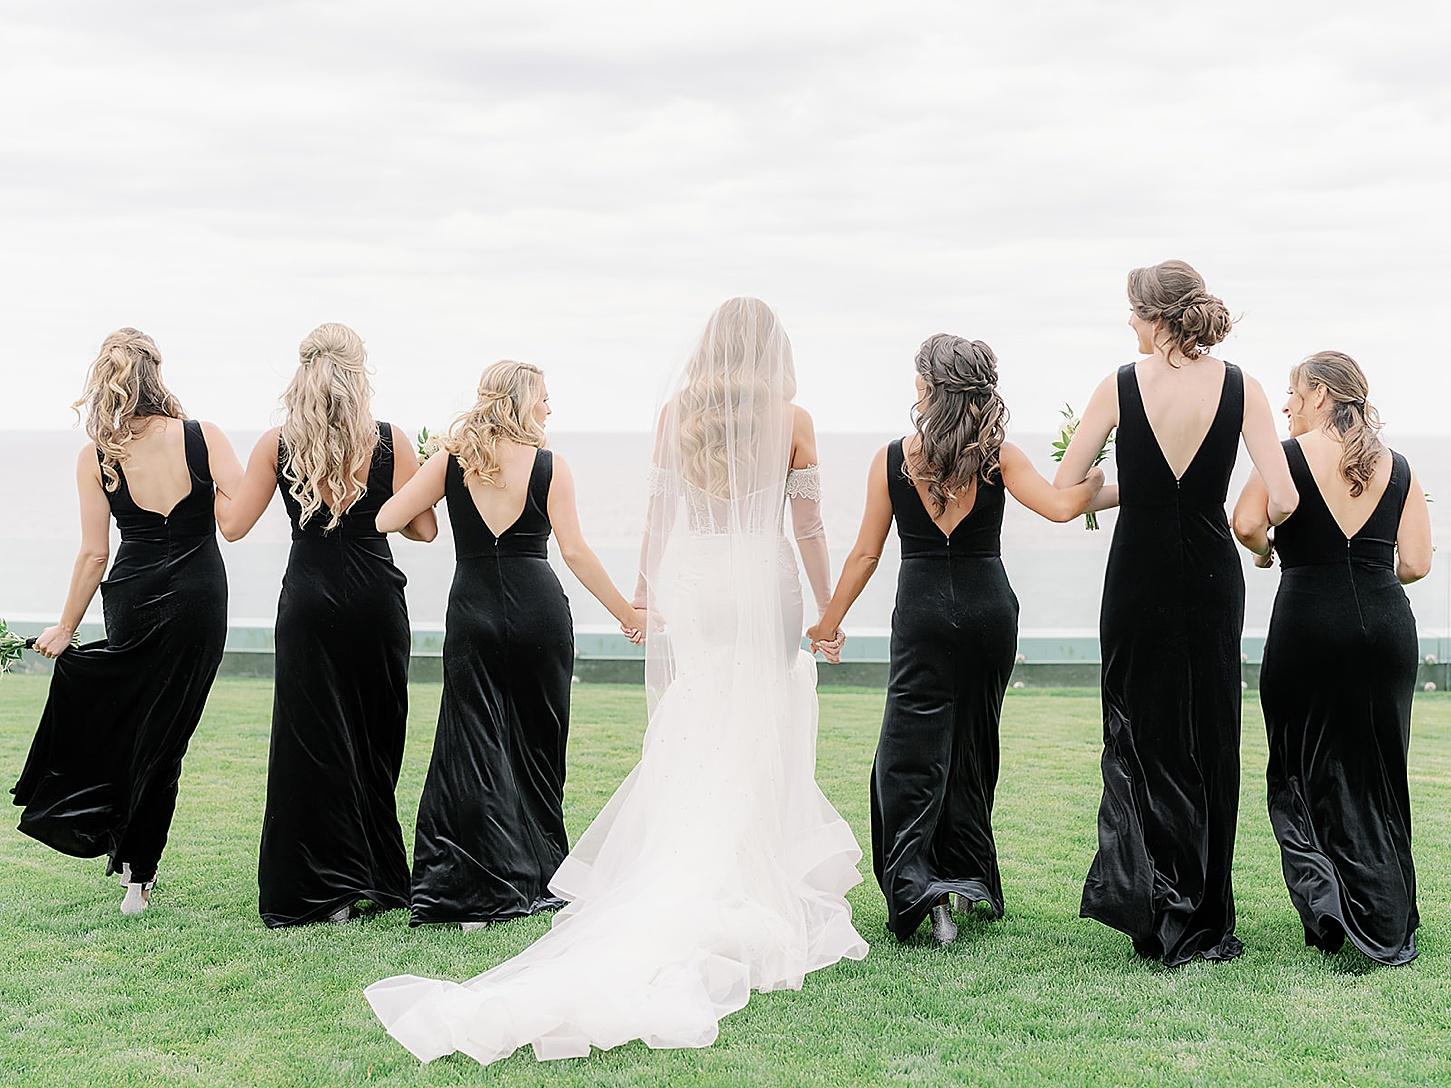 Atlantic City Wedding Photography Studio by Magdalena Studios Lexy Cha 0037